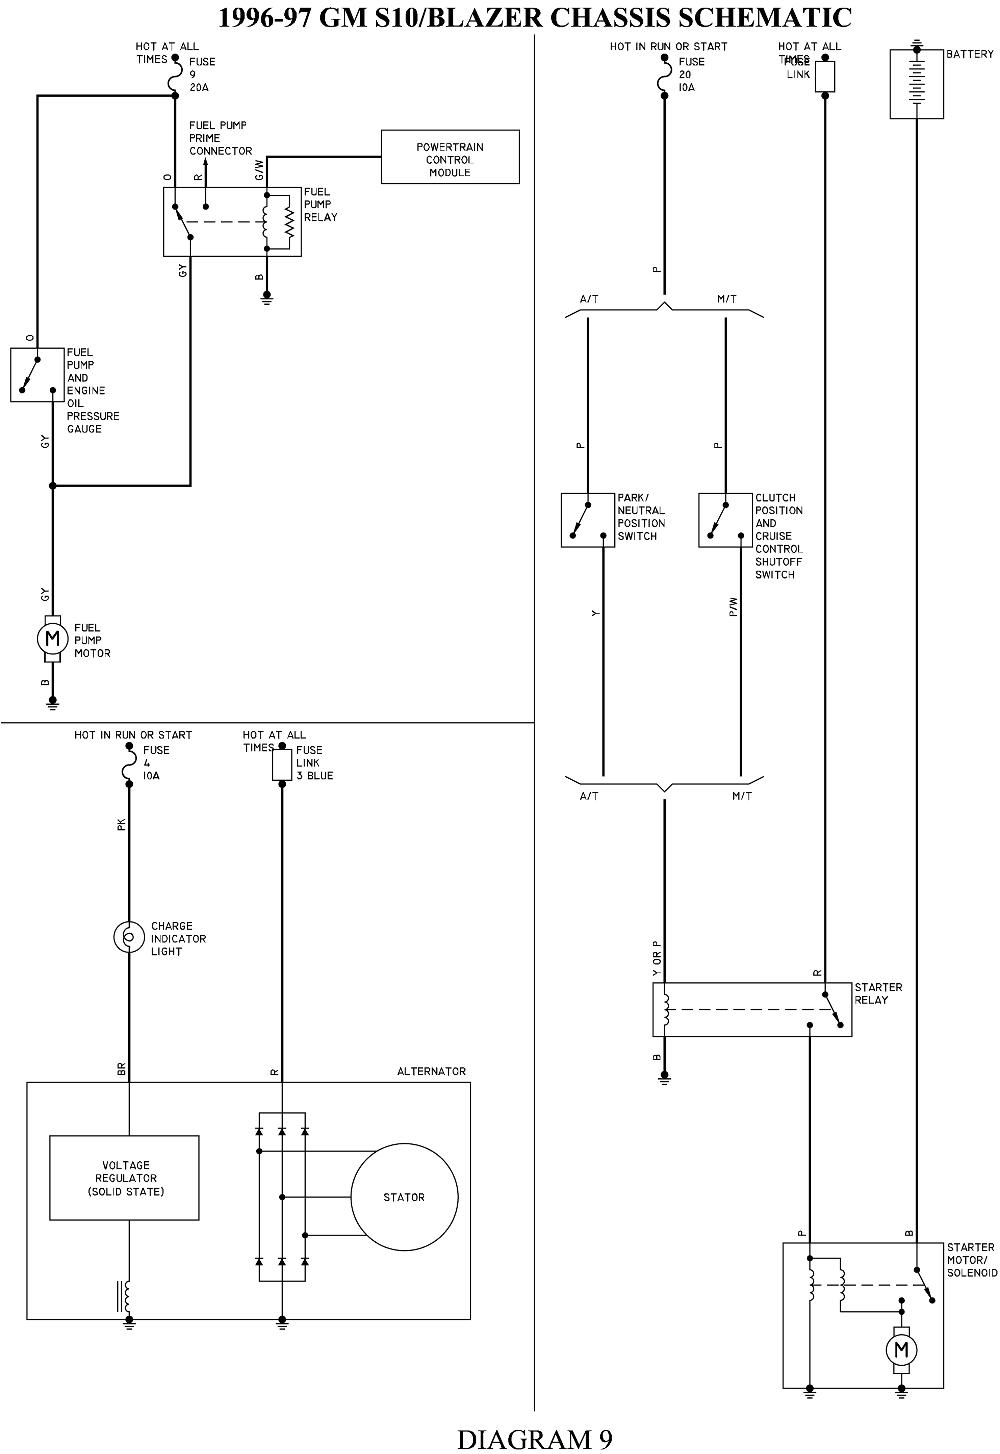 2001 s10 fuel pump wiring harness wiring diagram long 97 chevy blazer fuel pump wiring on